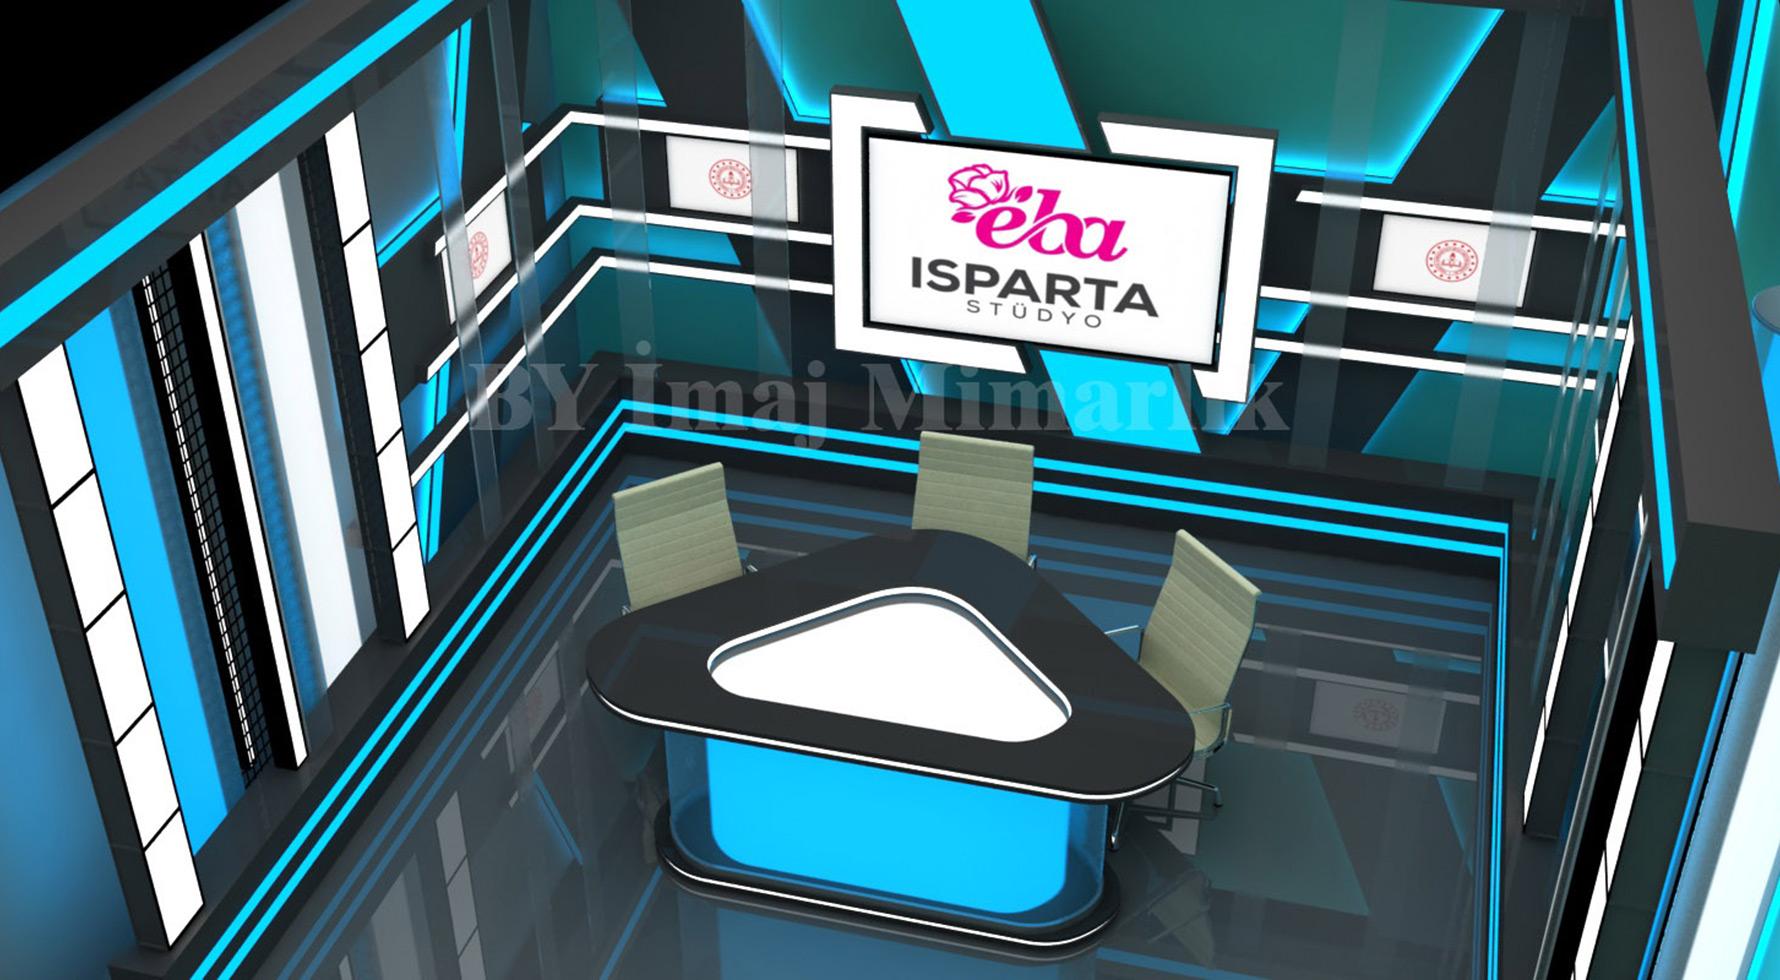 slayt EBA ISPARTA